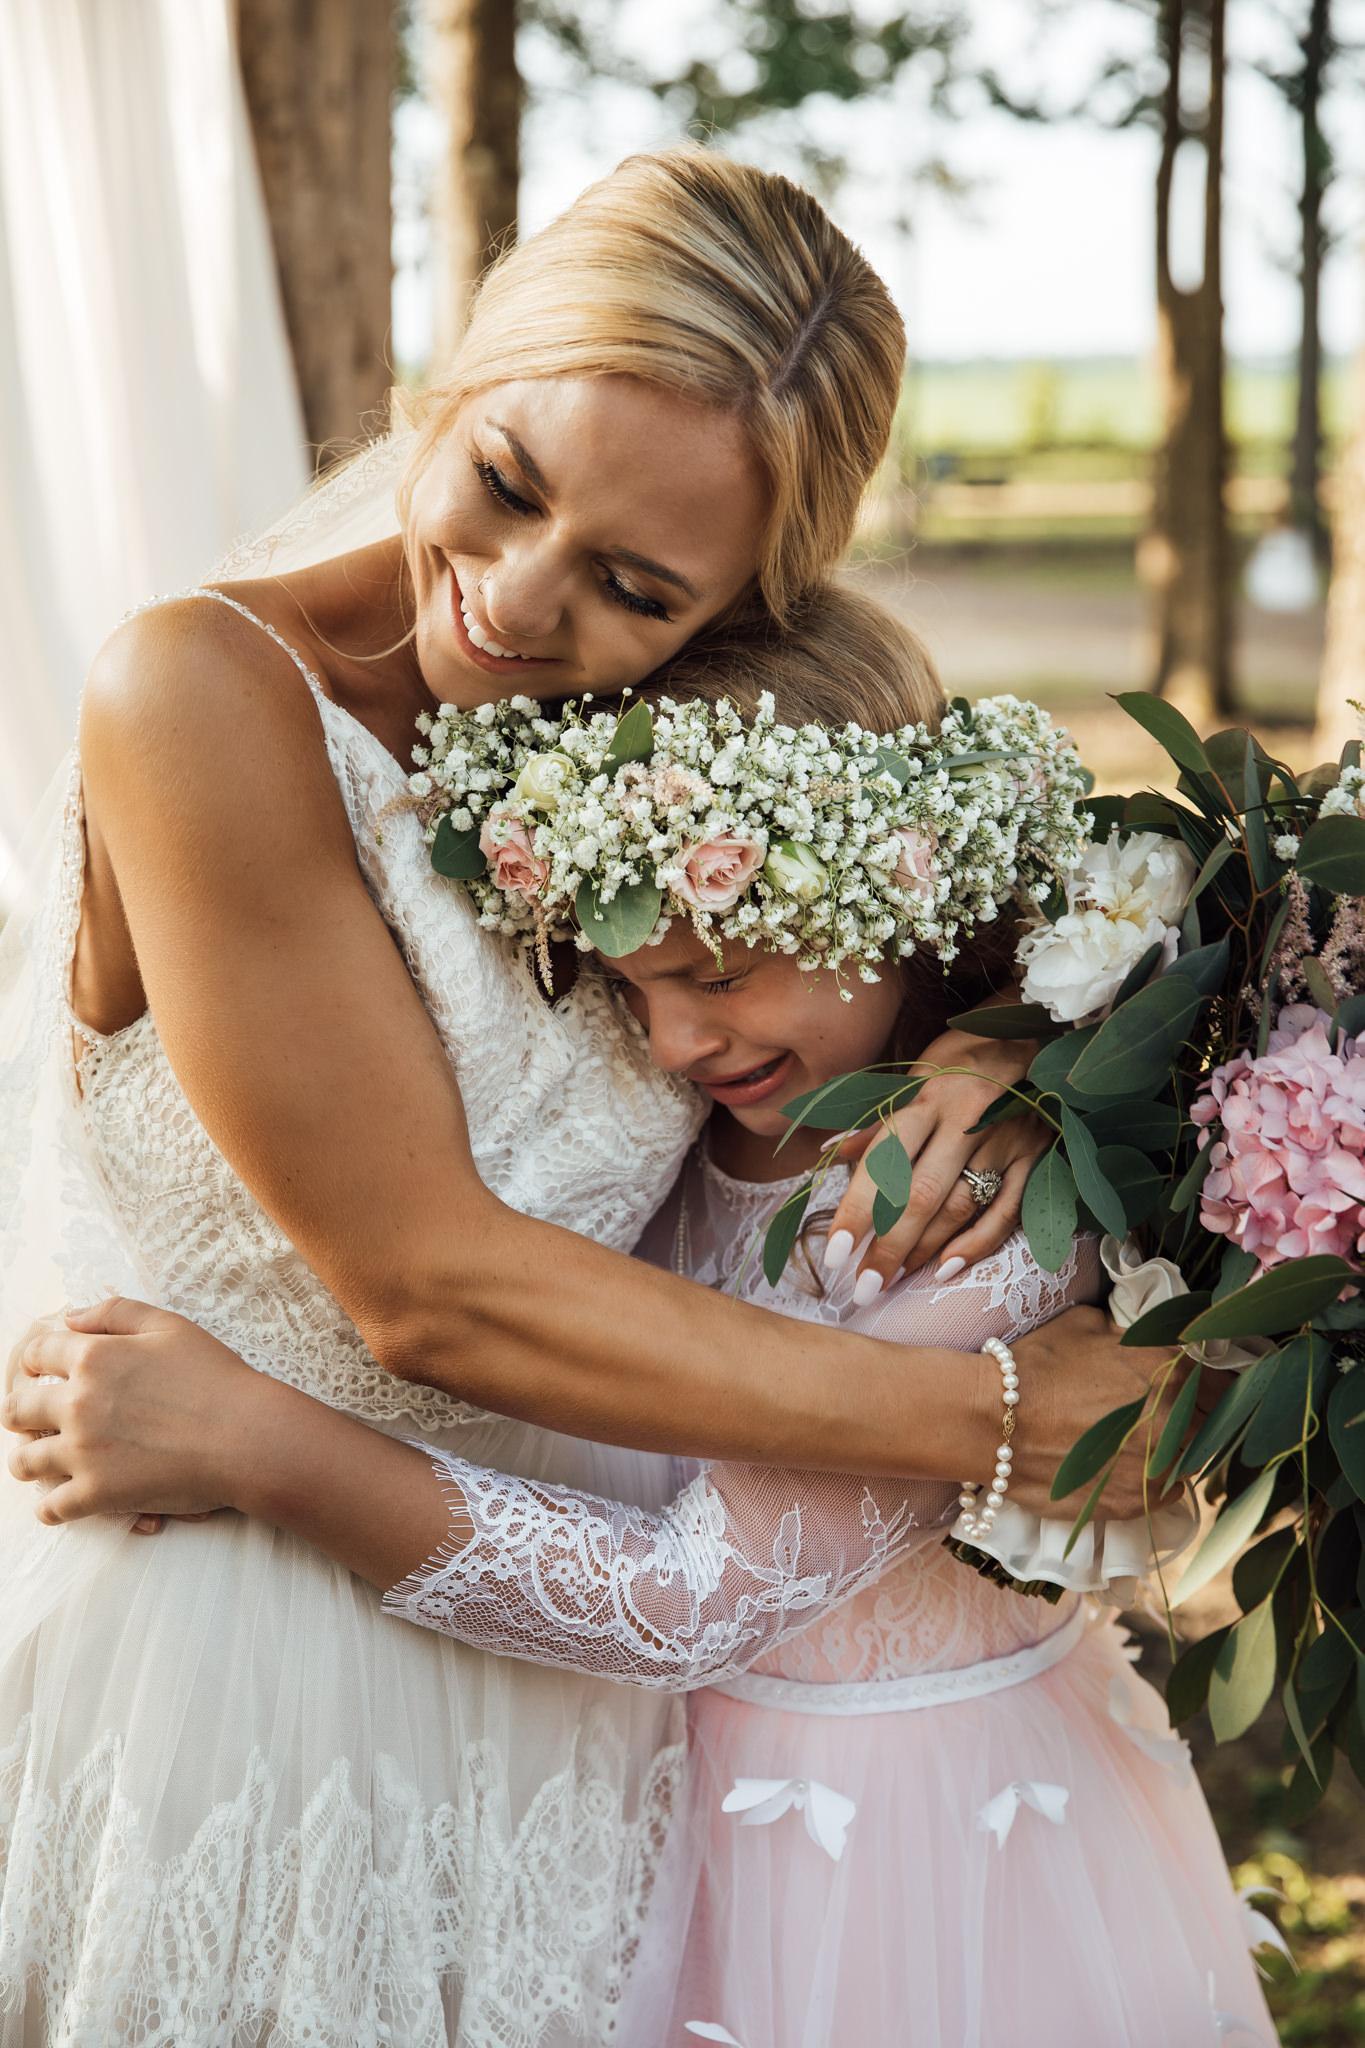 backyard-wedding-thewarmtharoundyou-lexy-branson-5.jpg